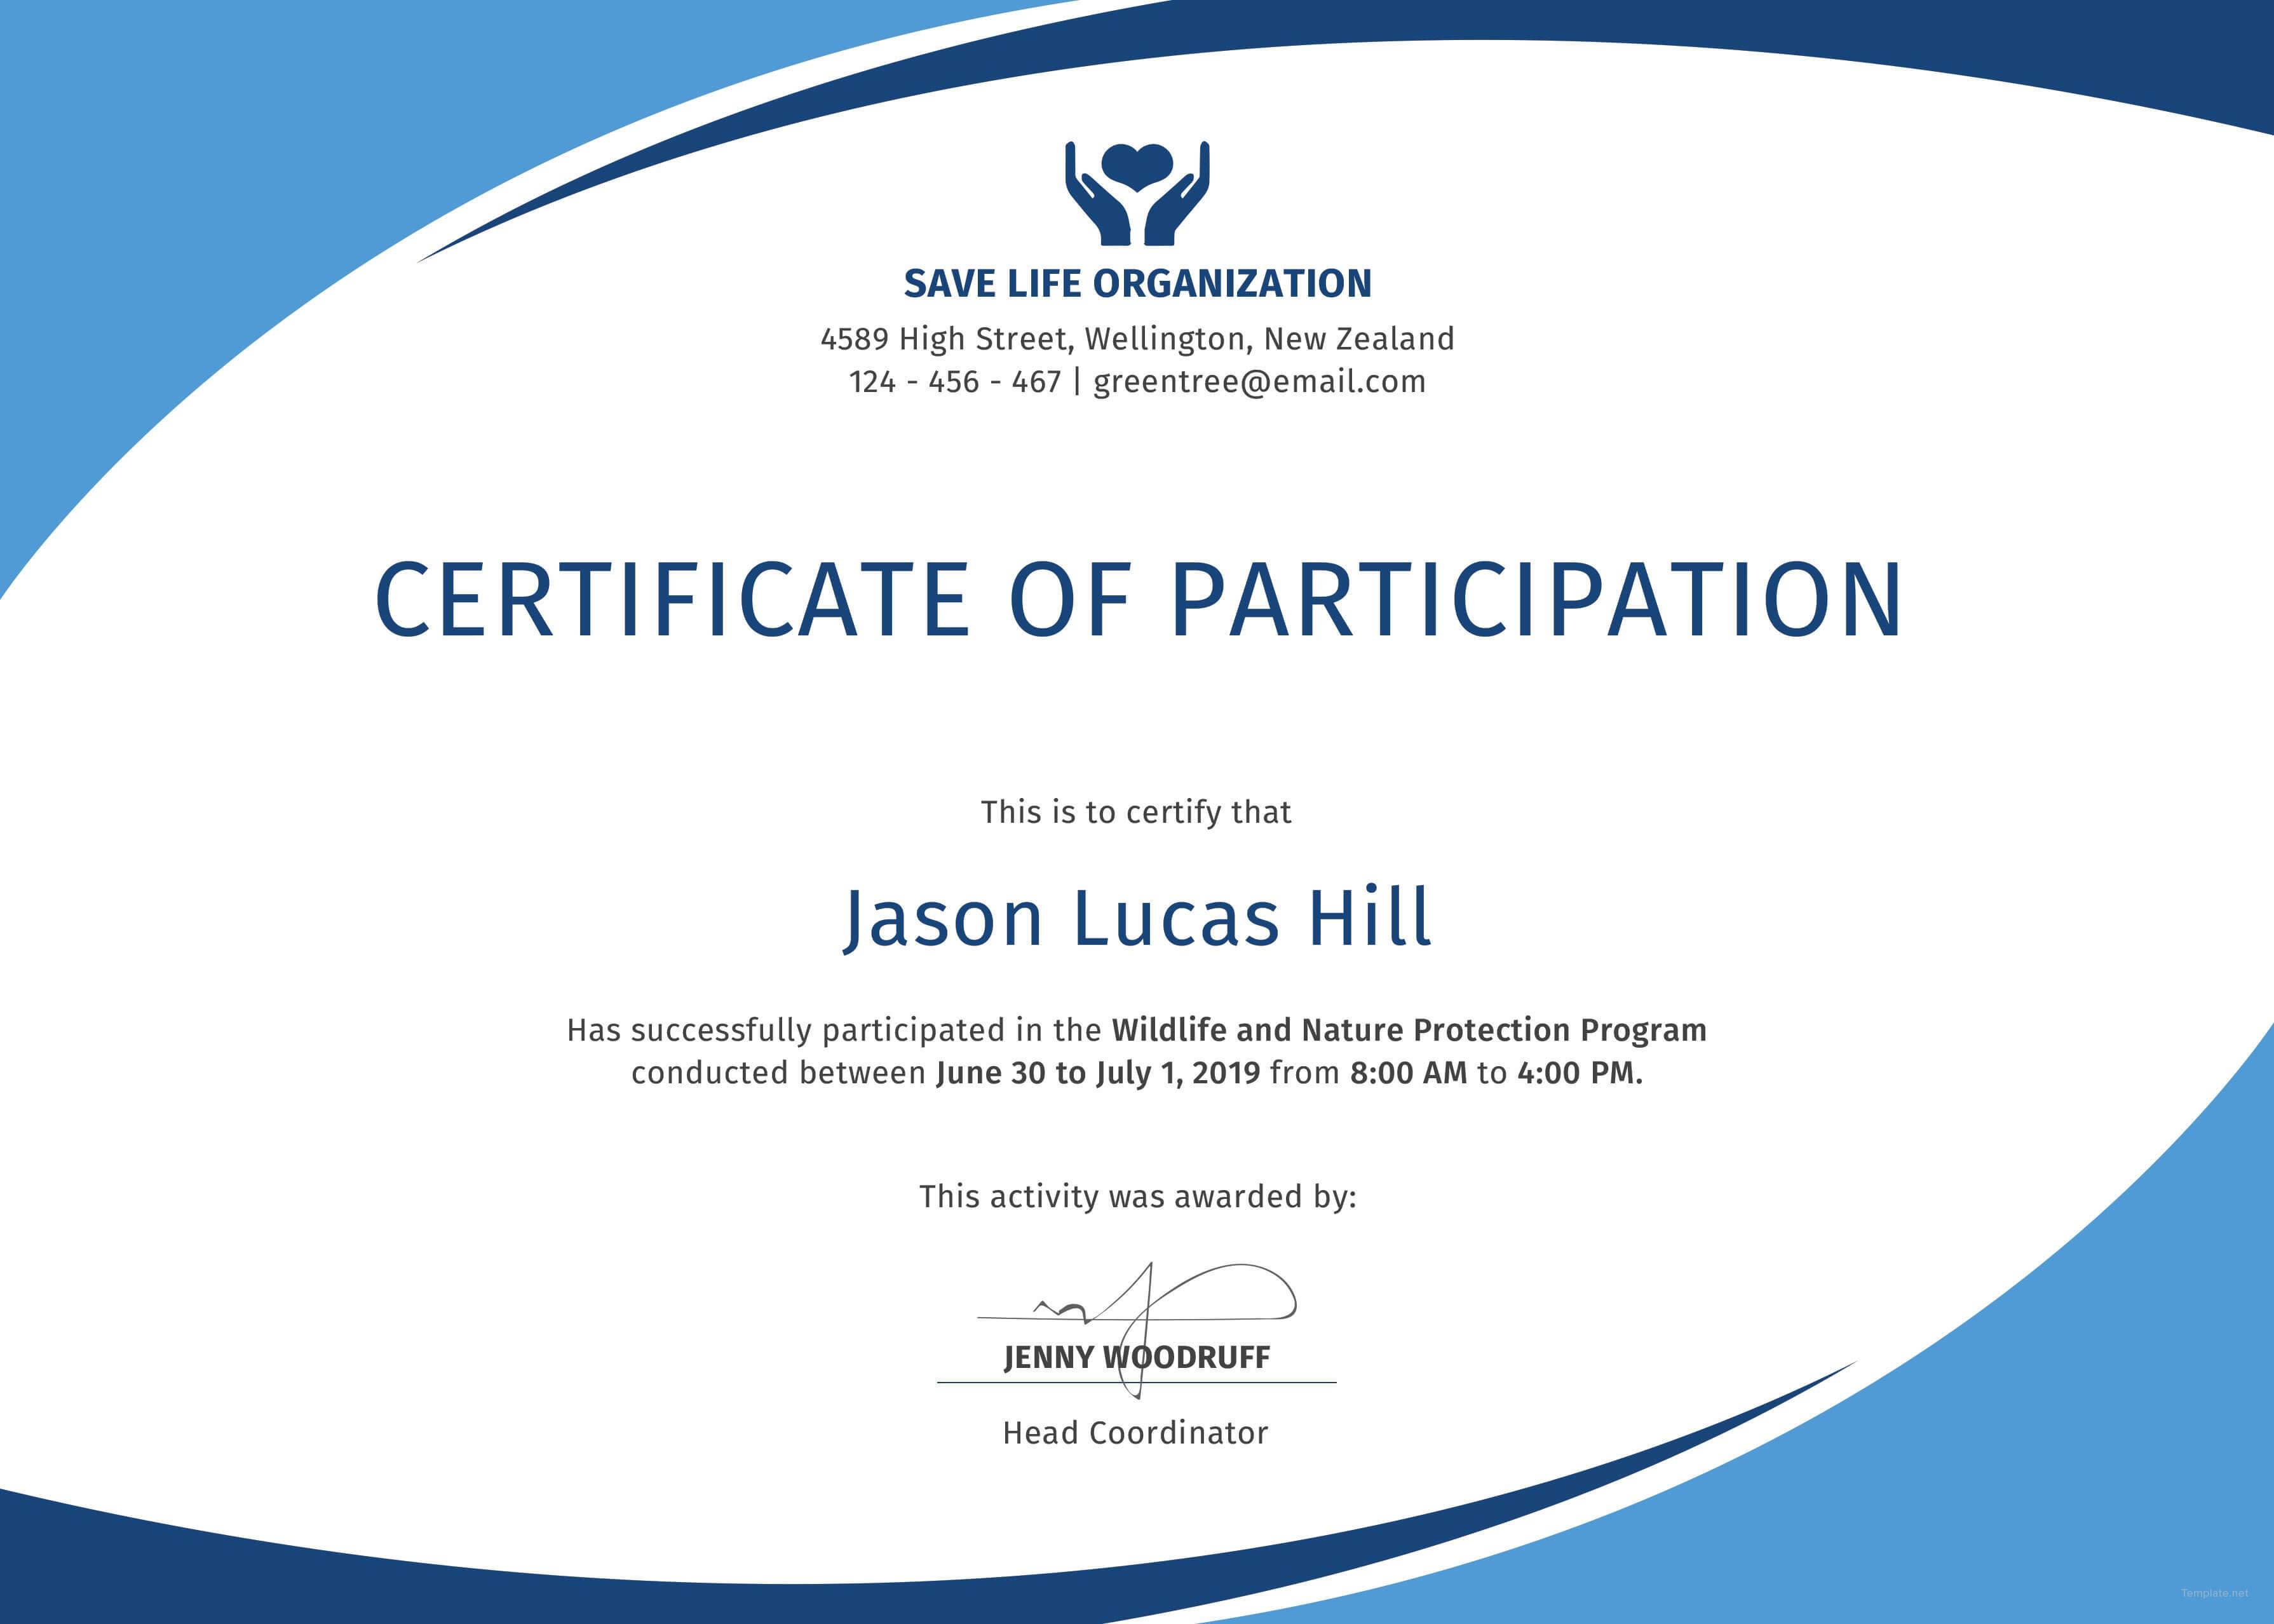 Certificate Of Participation Template 13 – Elsik Blue Cetane For Sample Certificate Of Participation Template